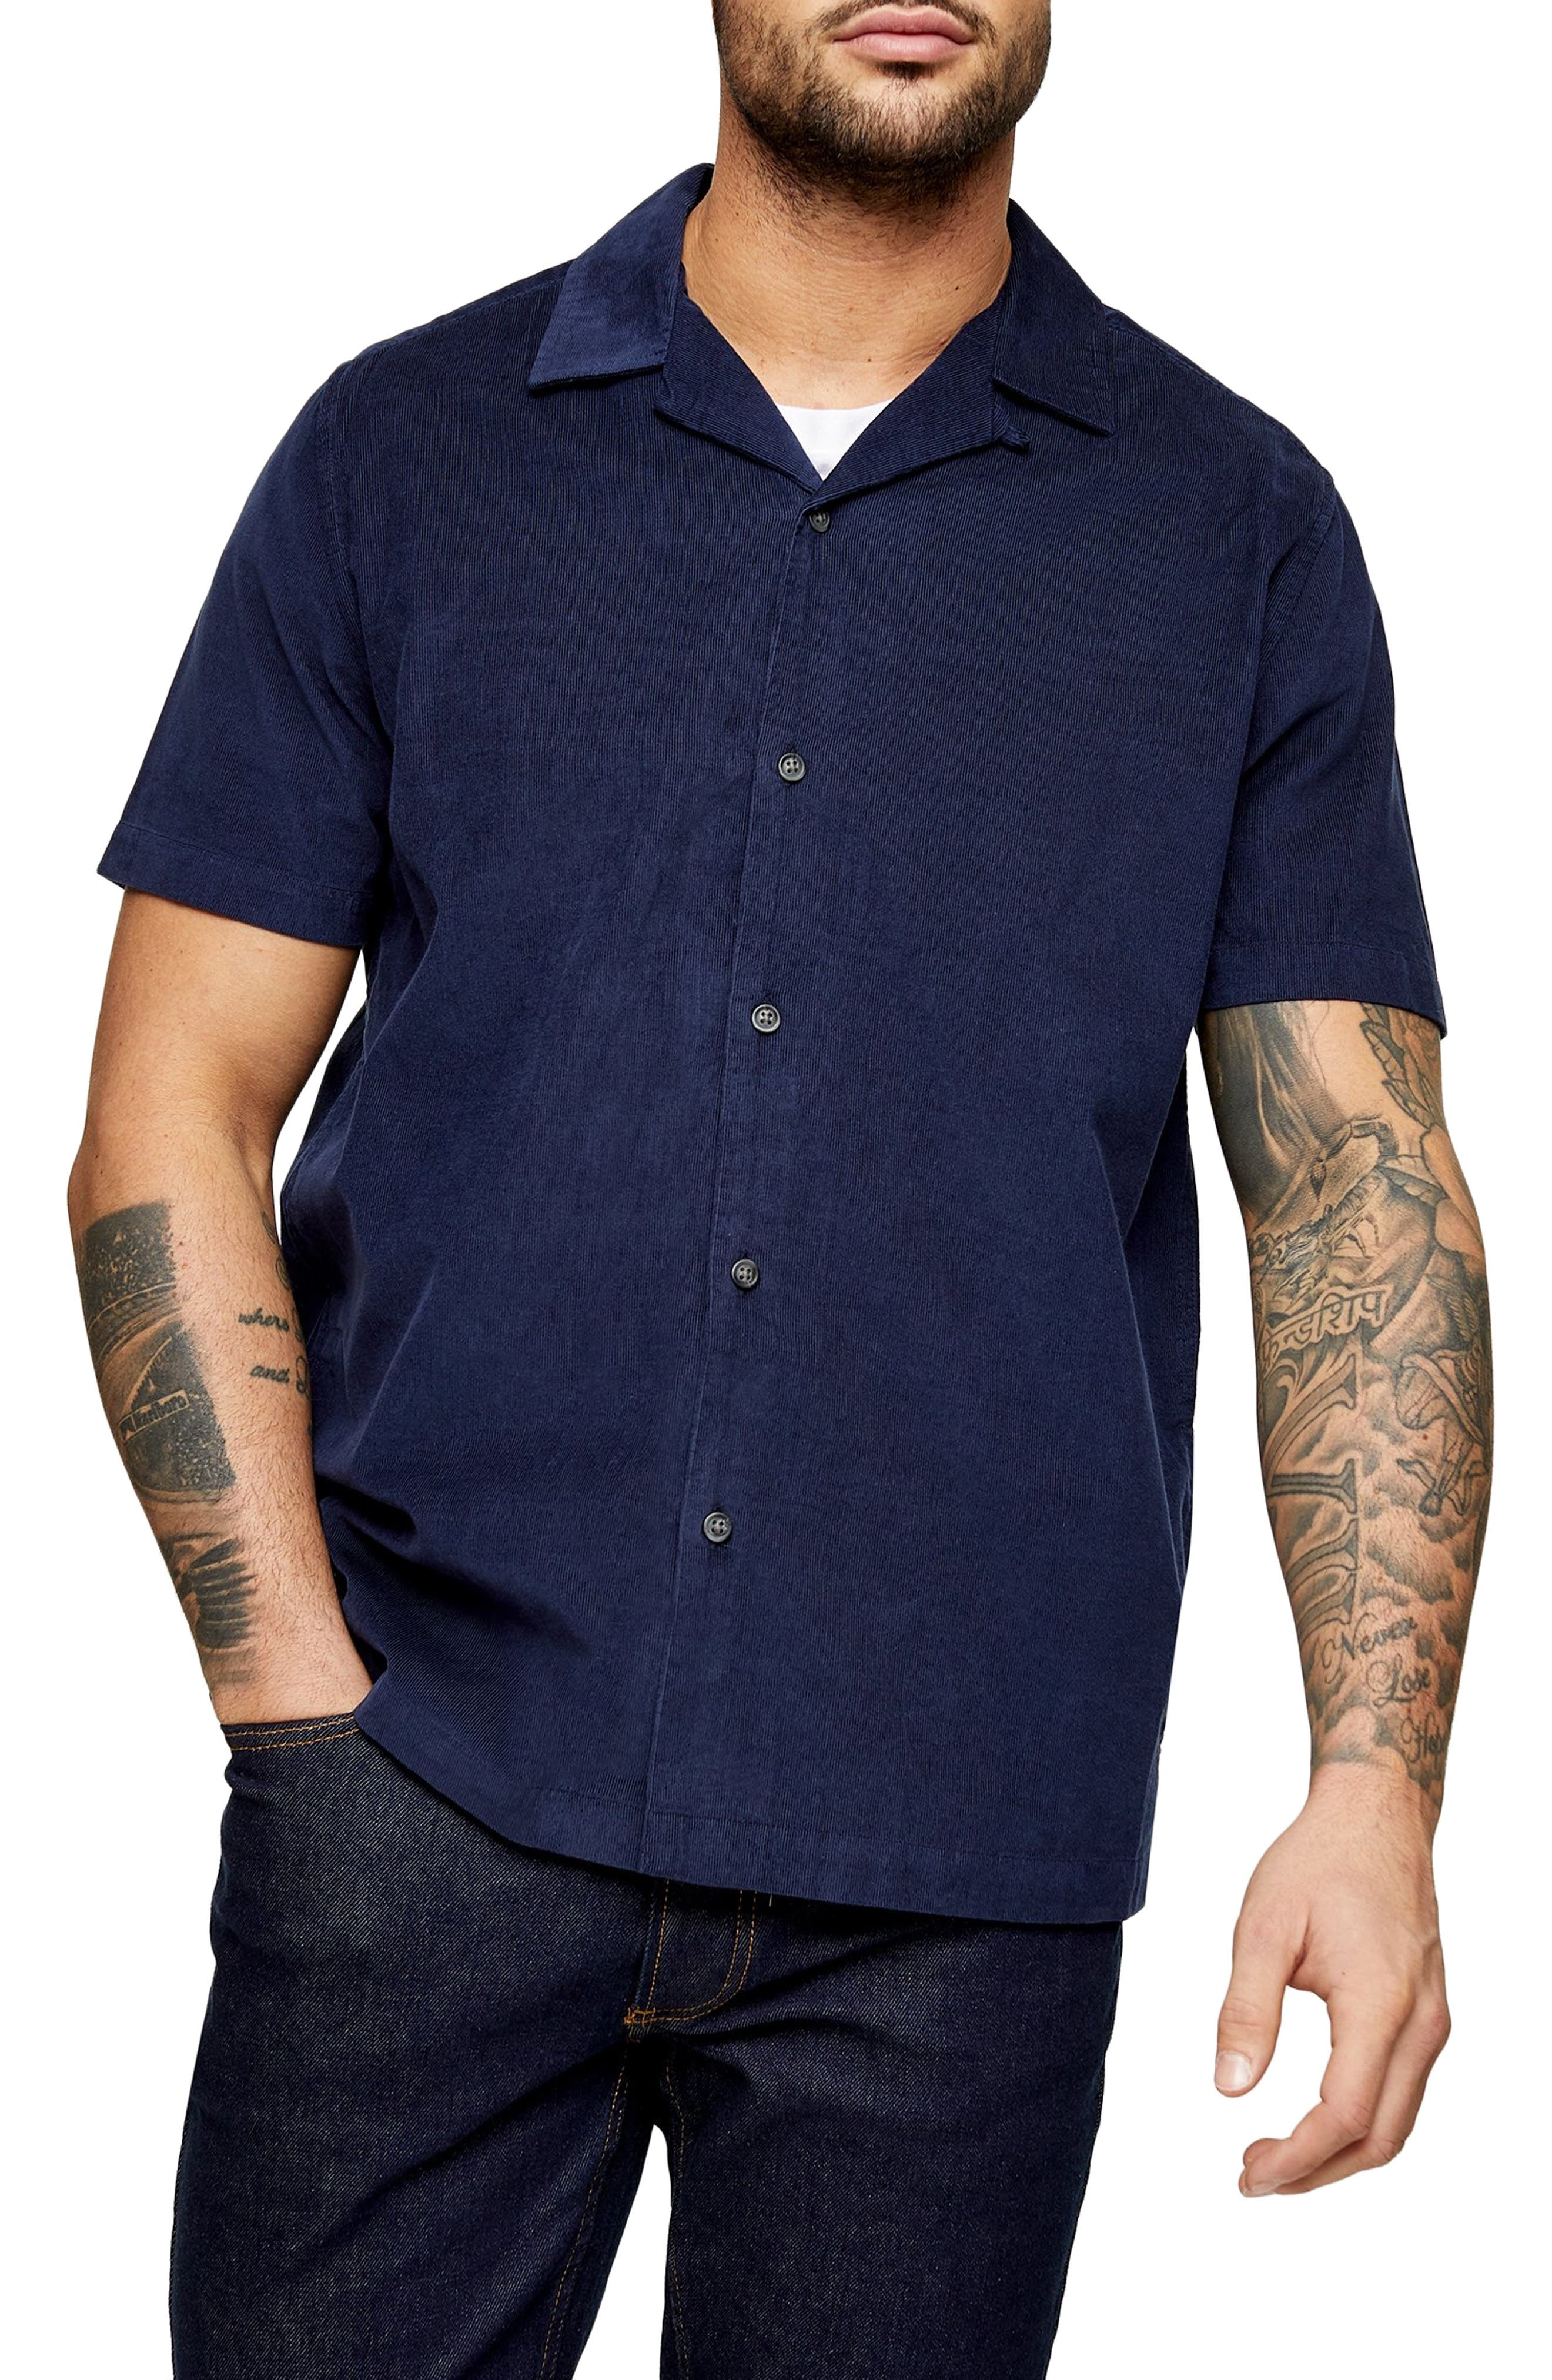 1940s Men's Shirts, Sweaters, Vests Mens Topman Short Sleeve Button-Up Corduroy Camp Shirt $27.00 AT vintagedancer.com